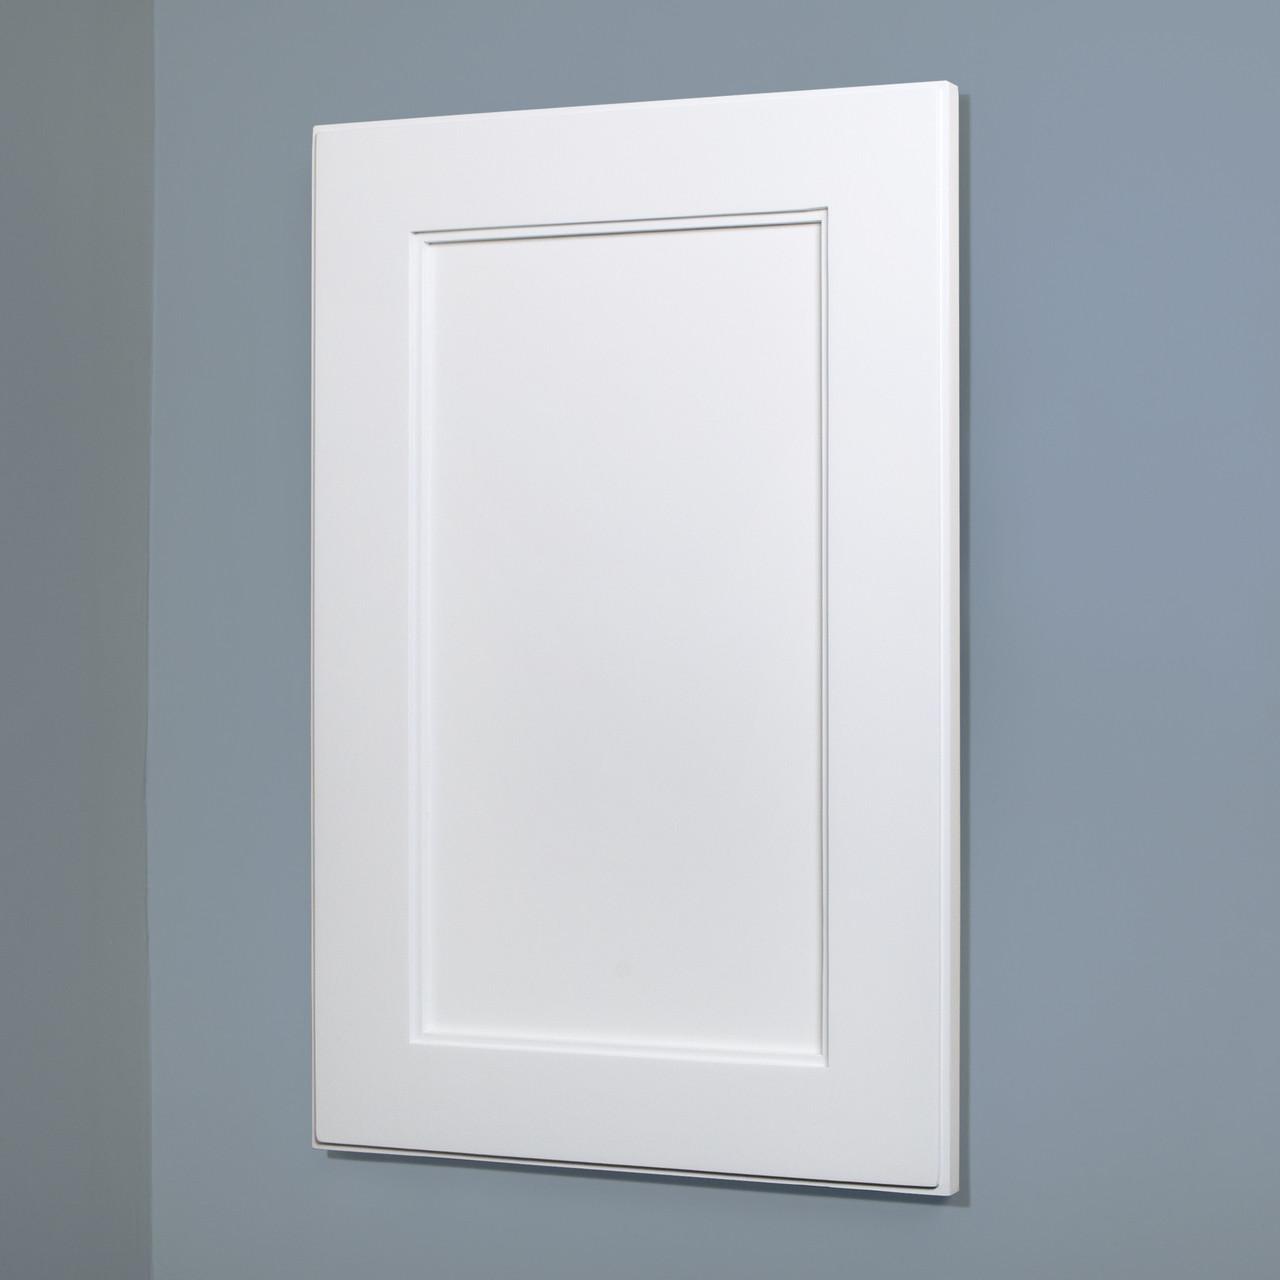 XL 14x24 White Wood Recessed Shaker Medicine Cabinet